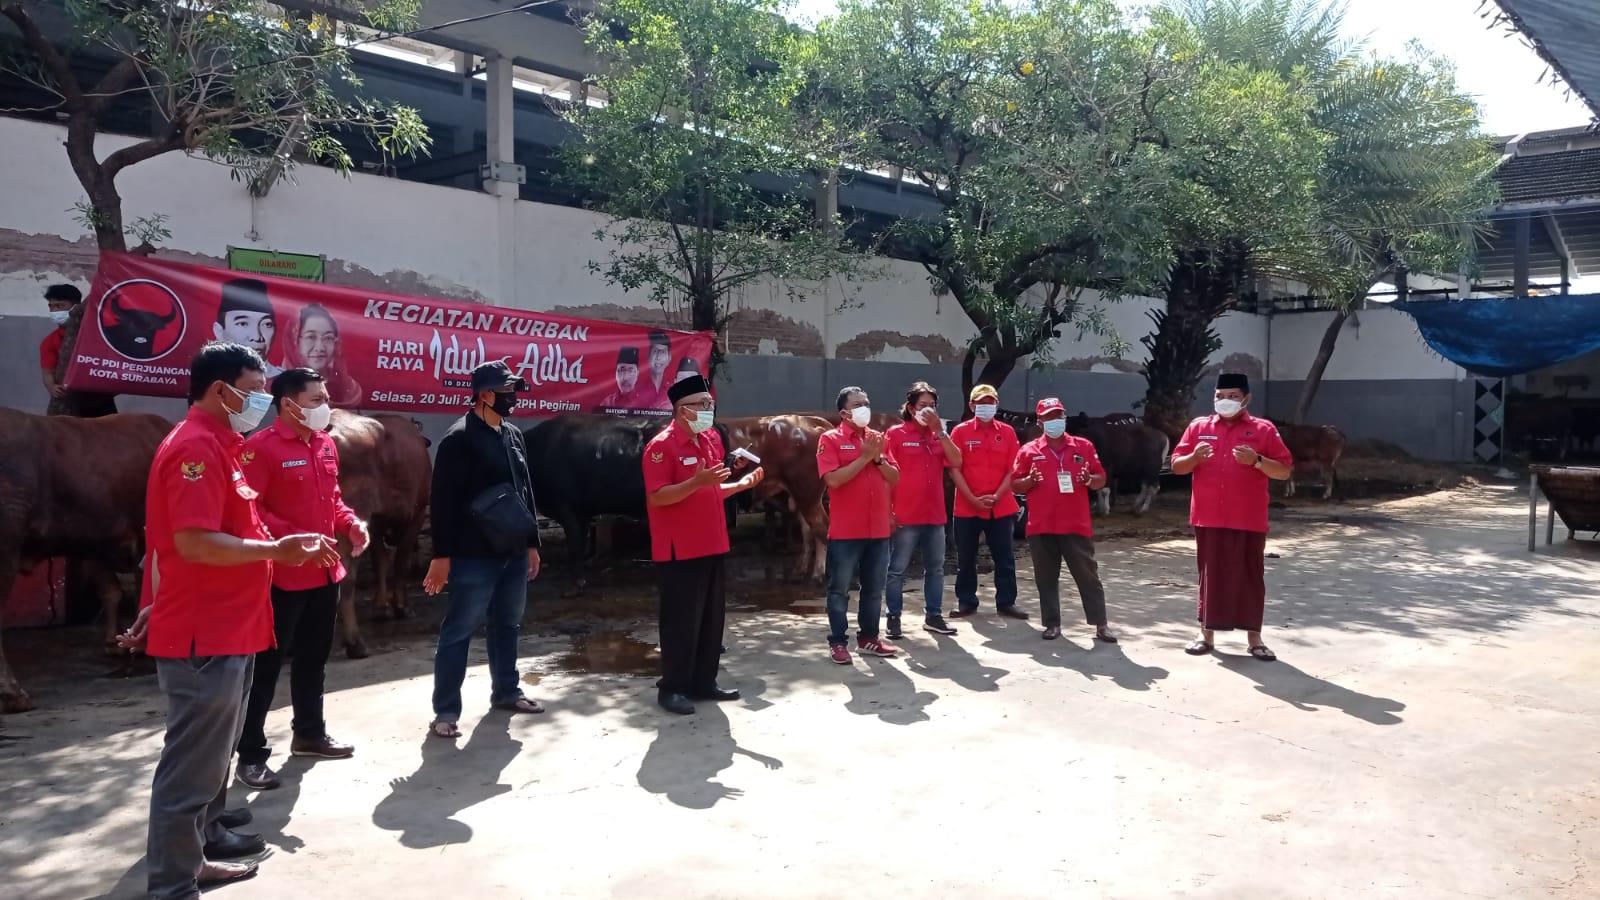 PDI Perjuangan Kota Surabaya Sembelih 6 Hewan Kurban di RPH